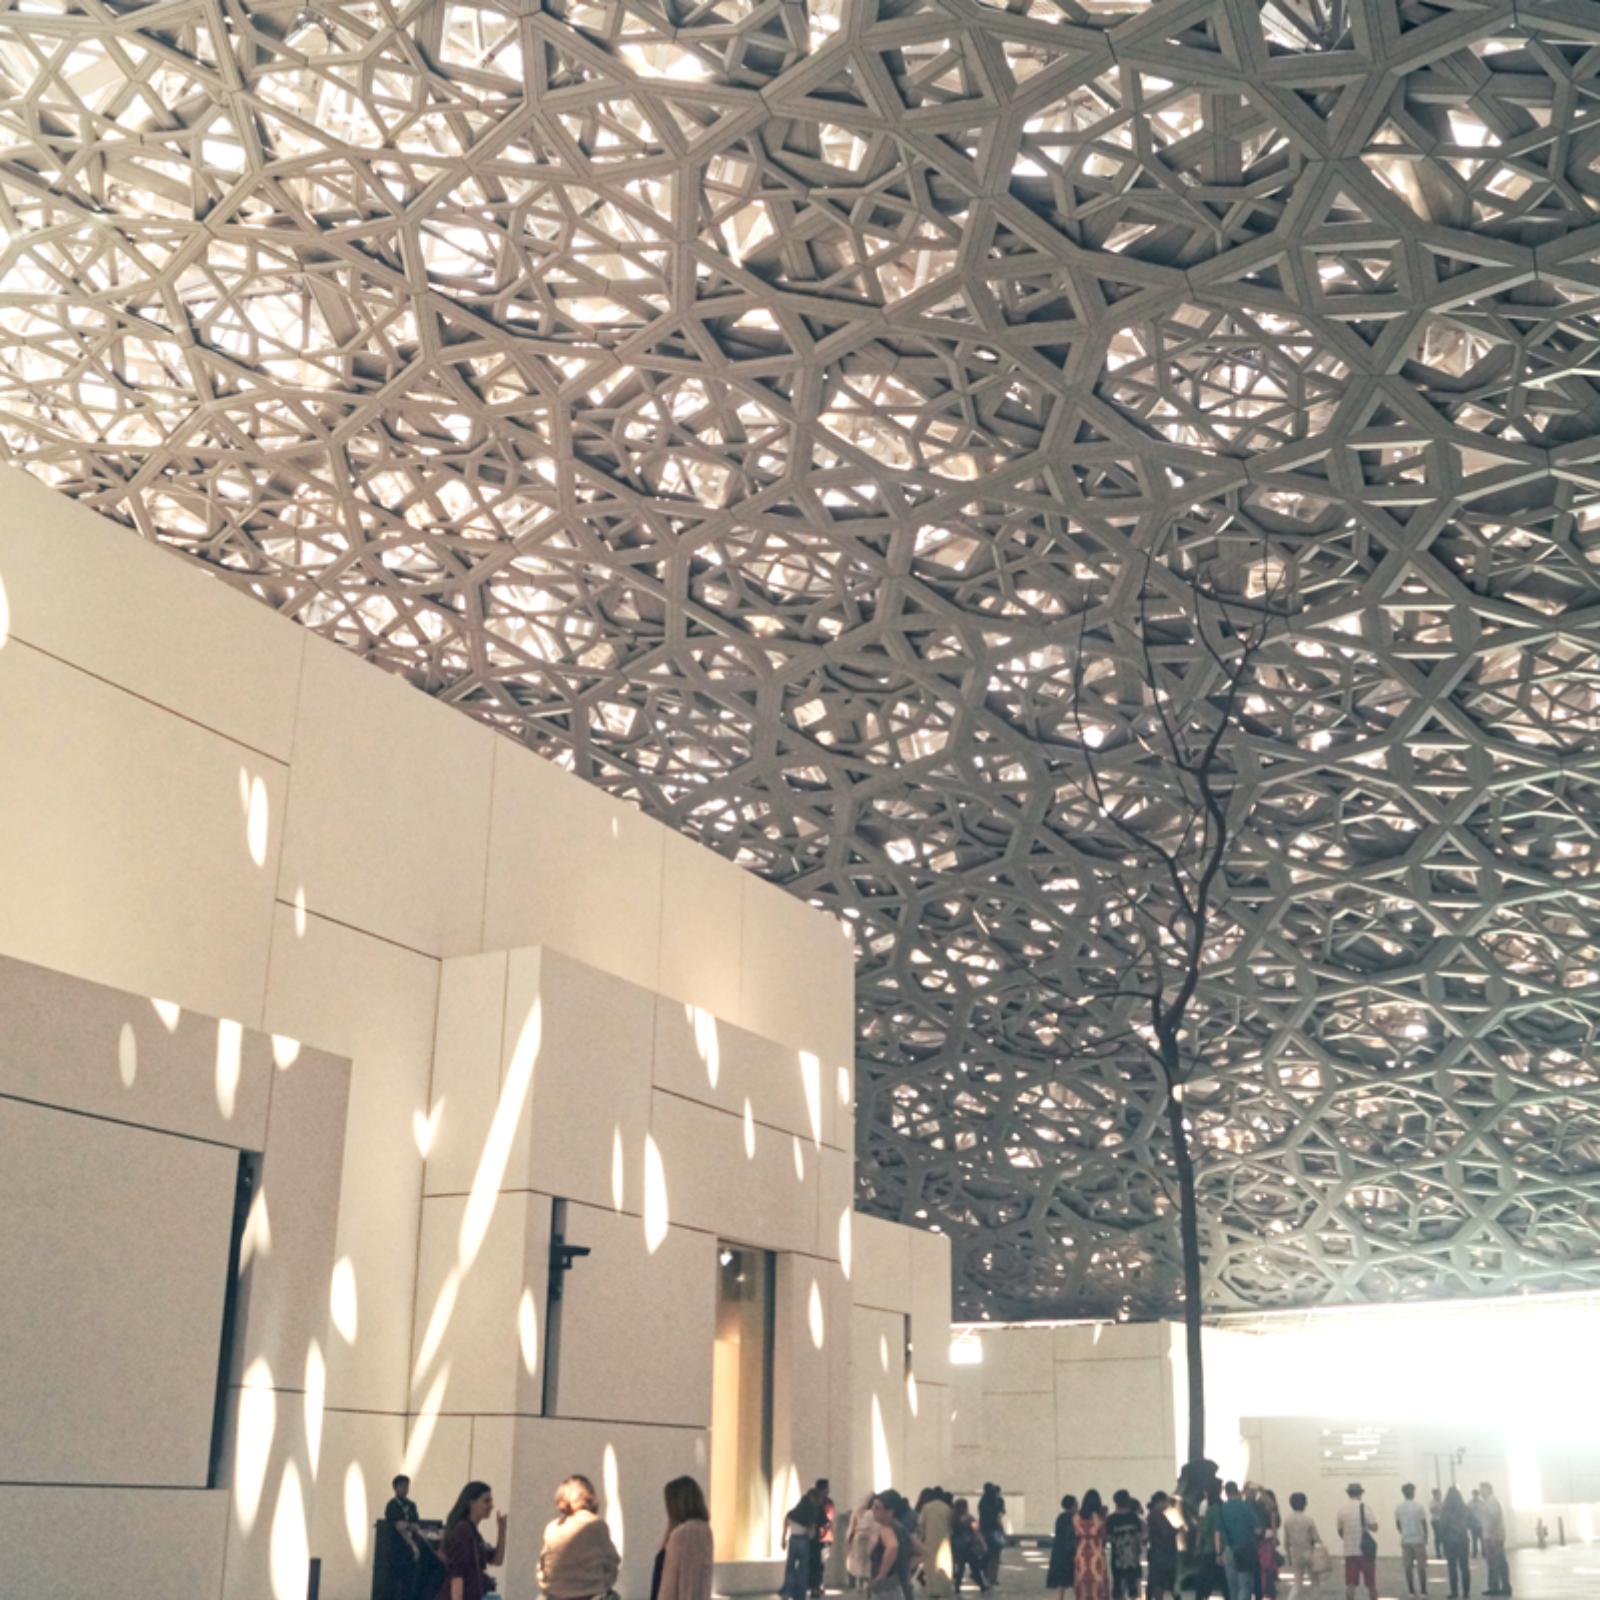 International-Conference-in-Dubai_9